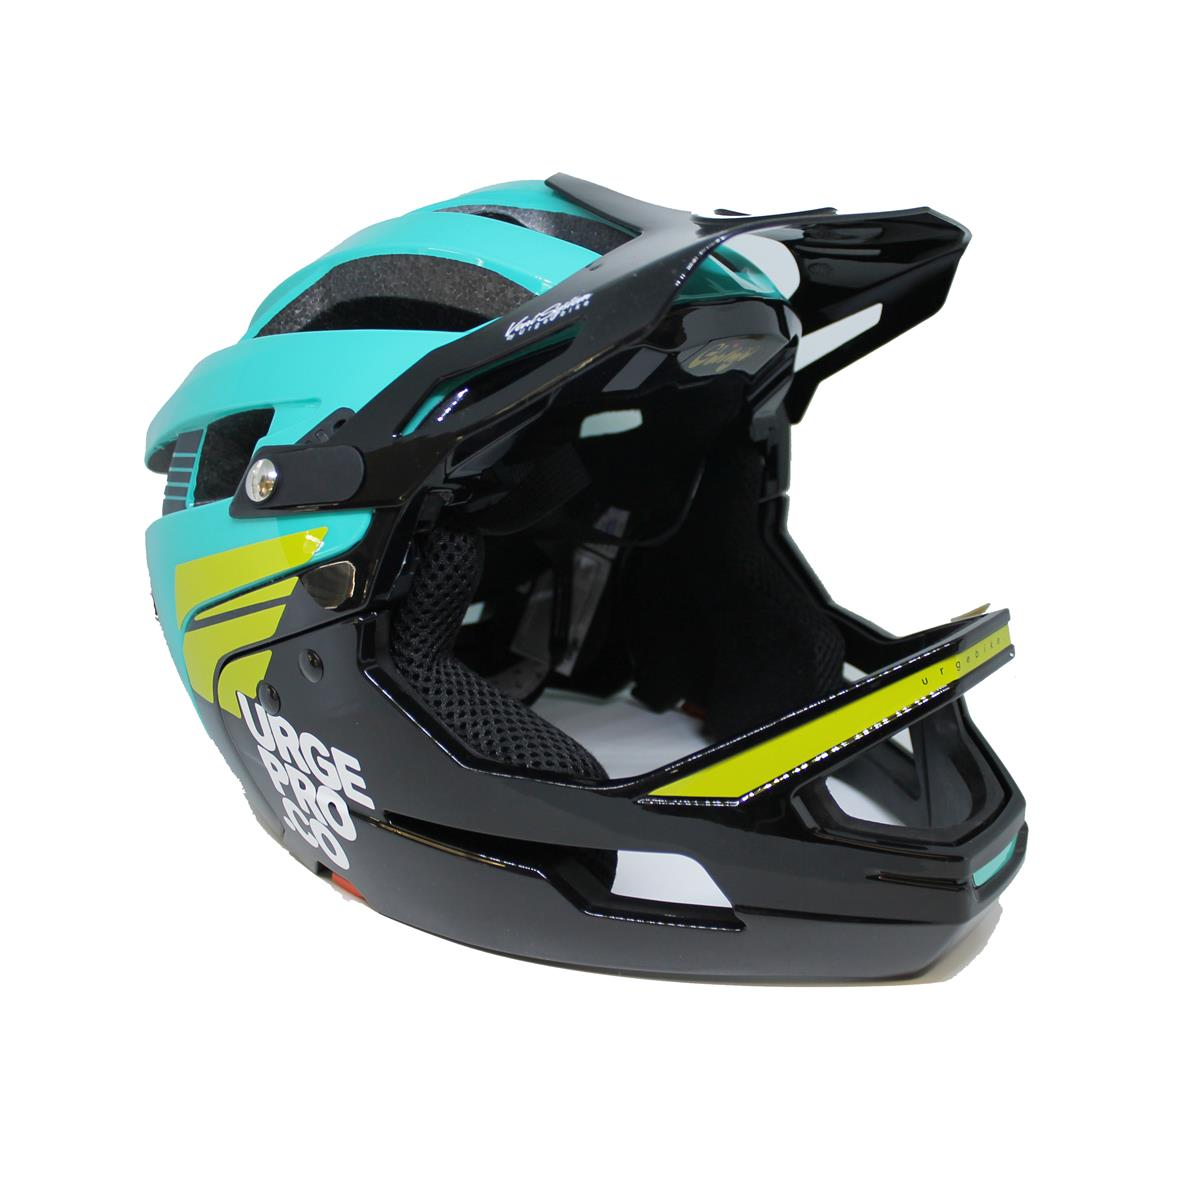 Full face helmet Gringo de la Pampa light blue size S/M (55-58)